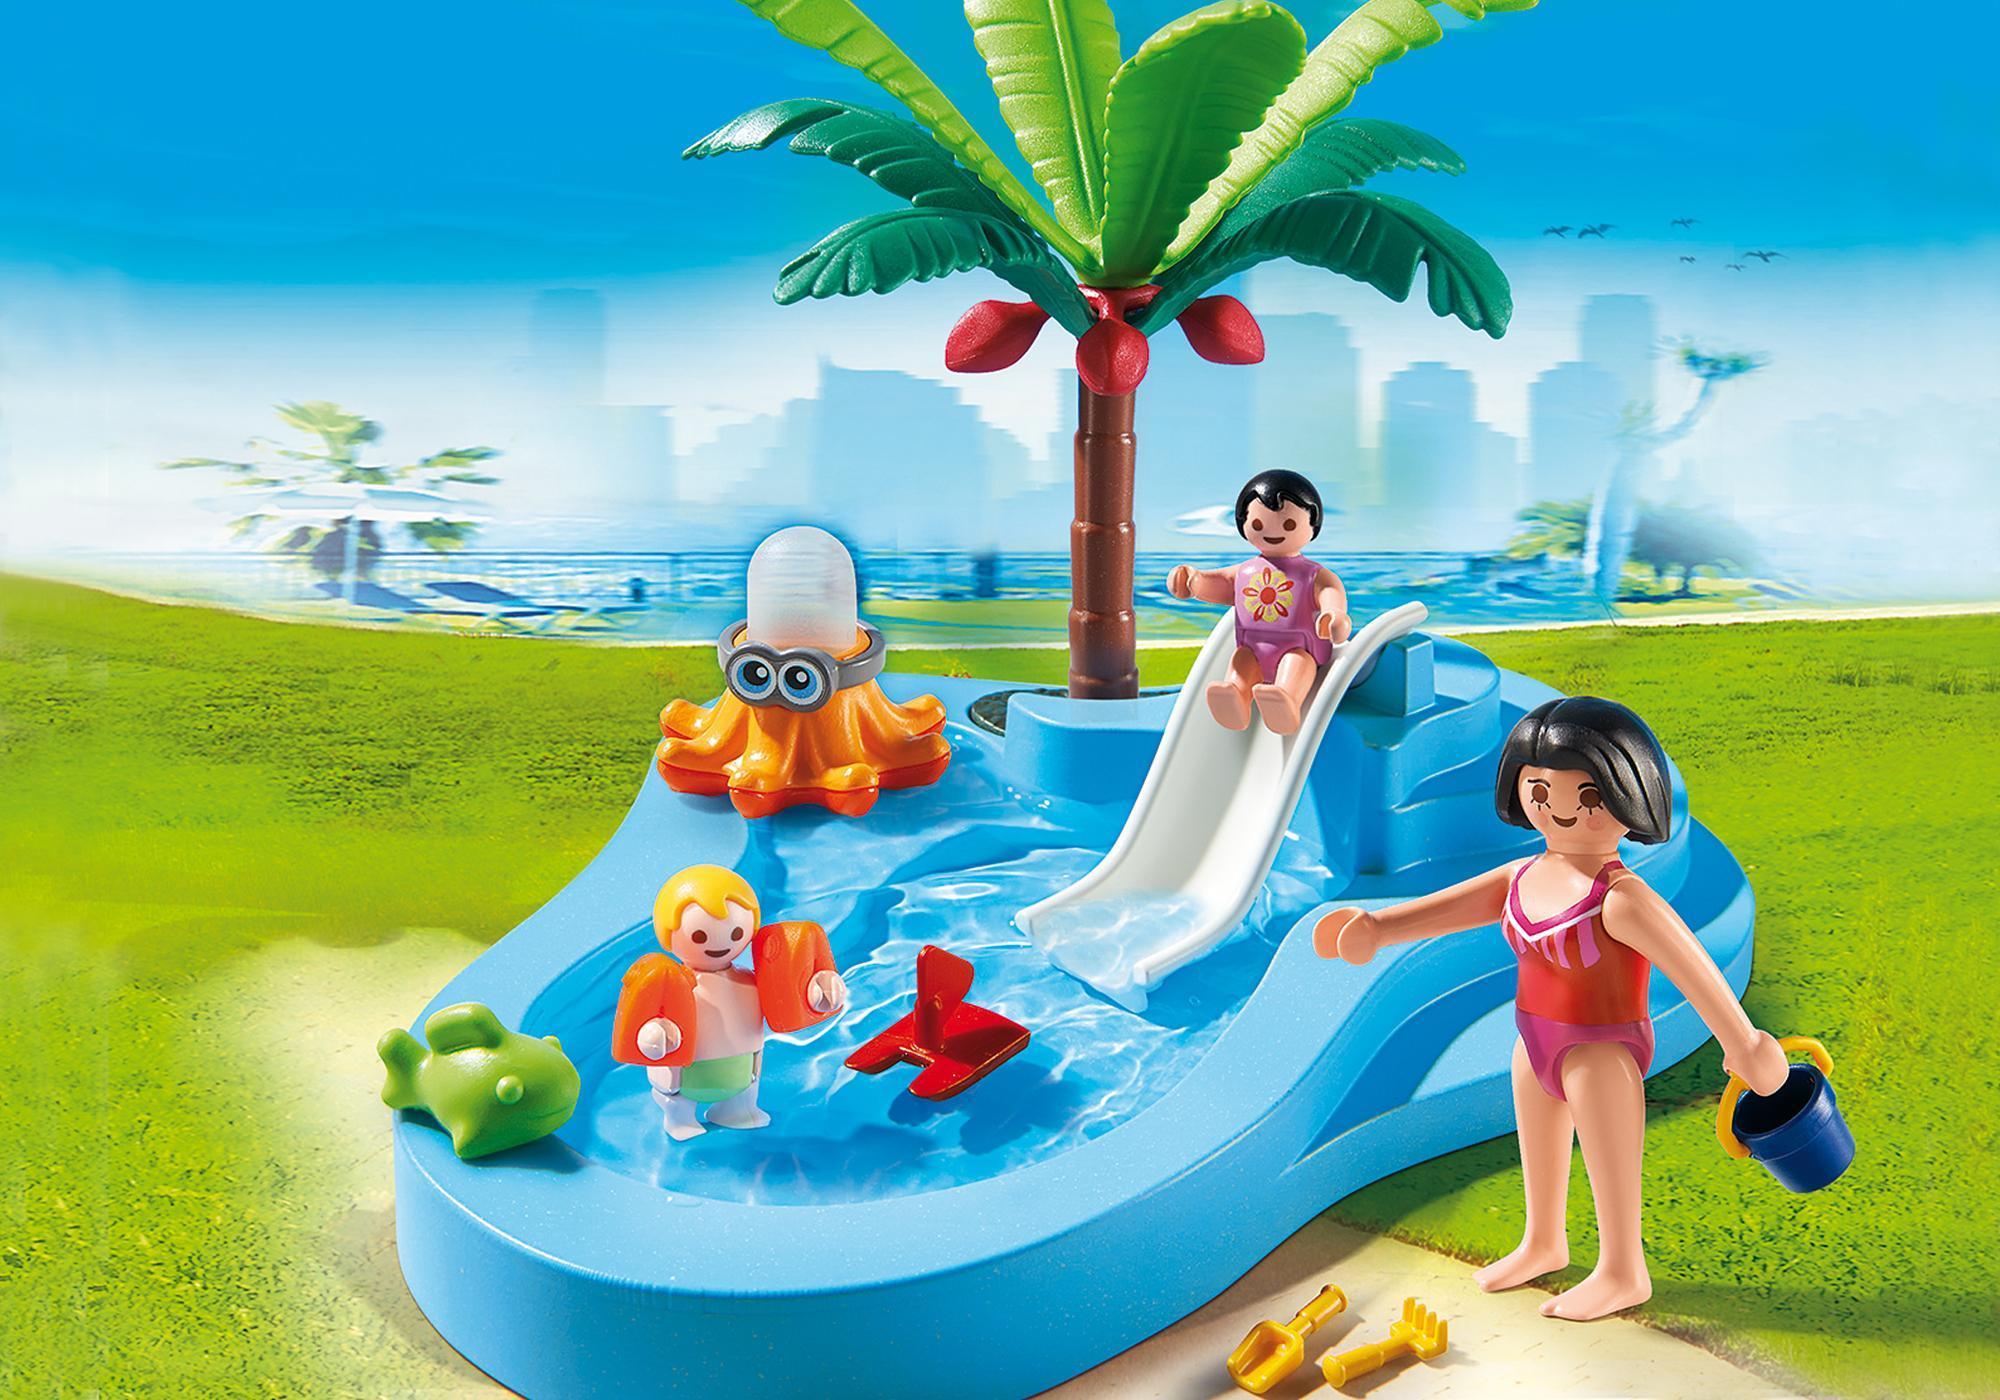 http://media.playmobil.com/i/playmobil/6673_product_detail/Kinderbad met glijbaan